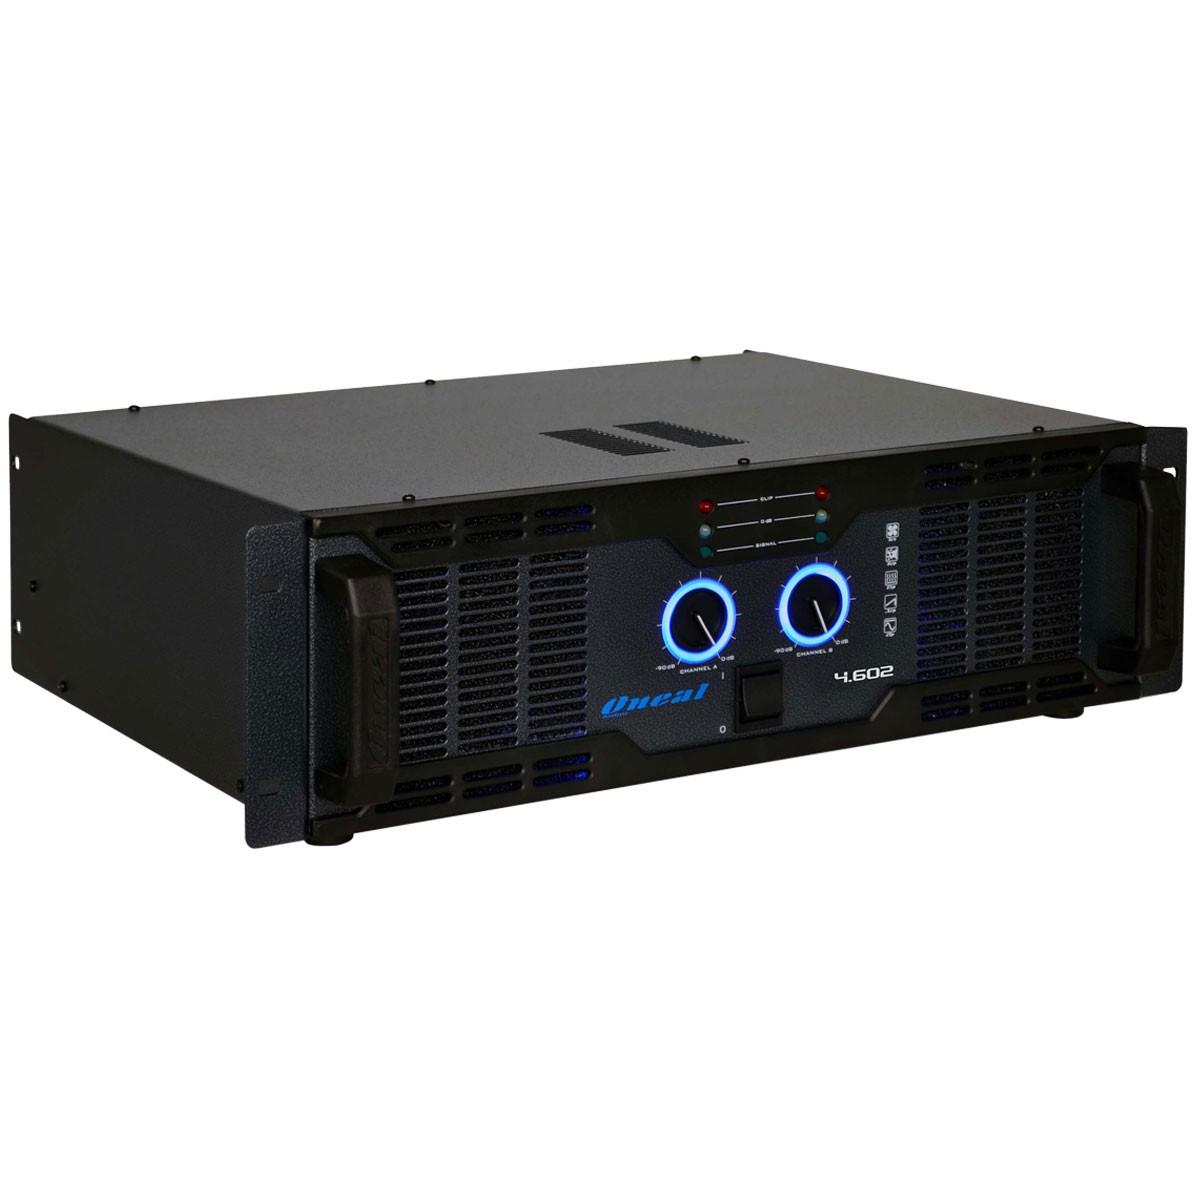 Amplificador de Potência 400W 8 Ohms  - OLP 4 602 Oneal